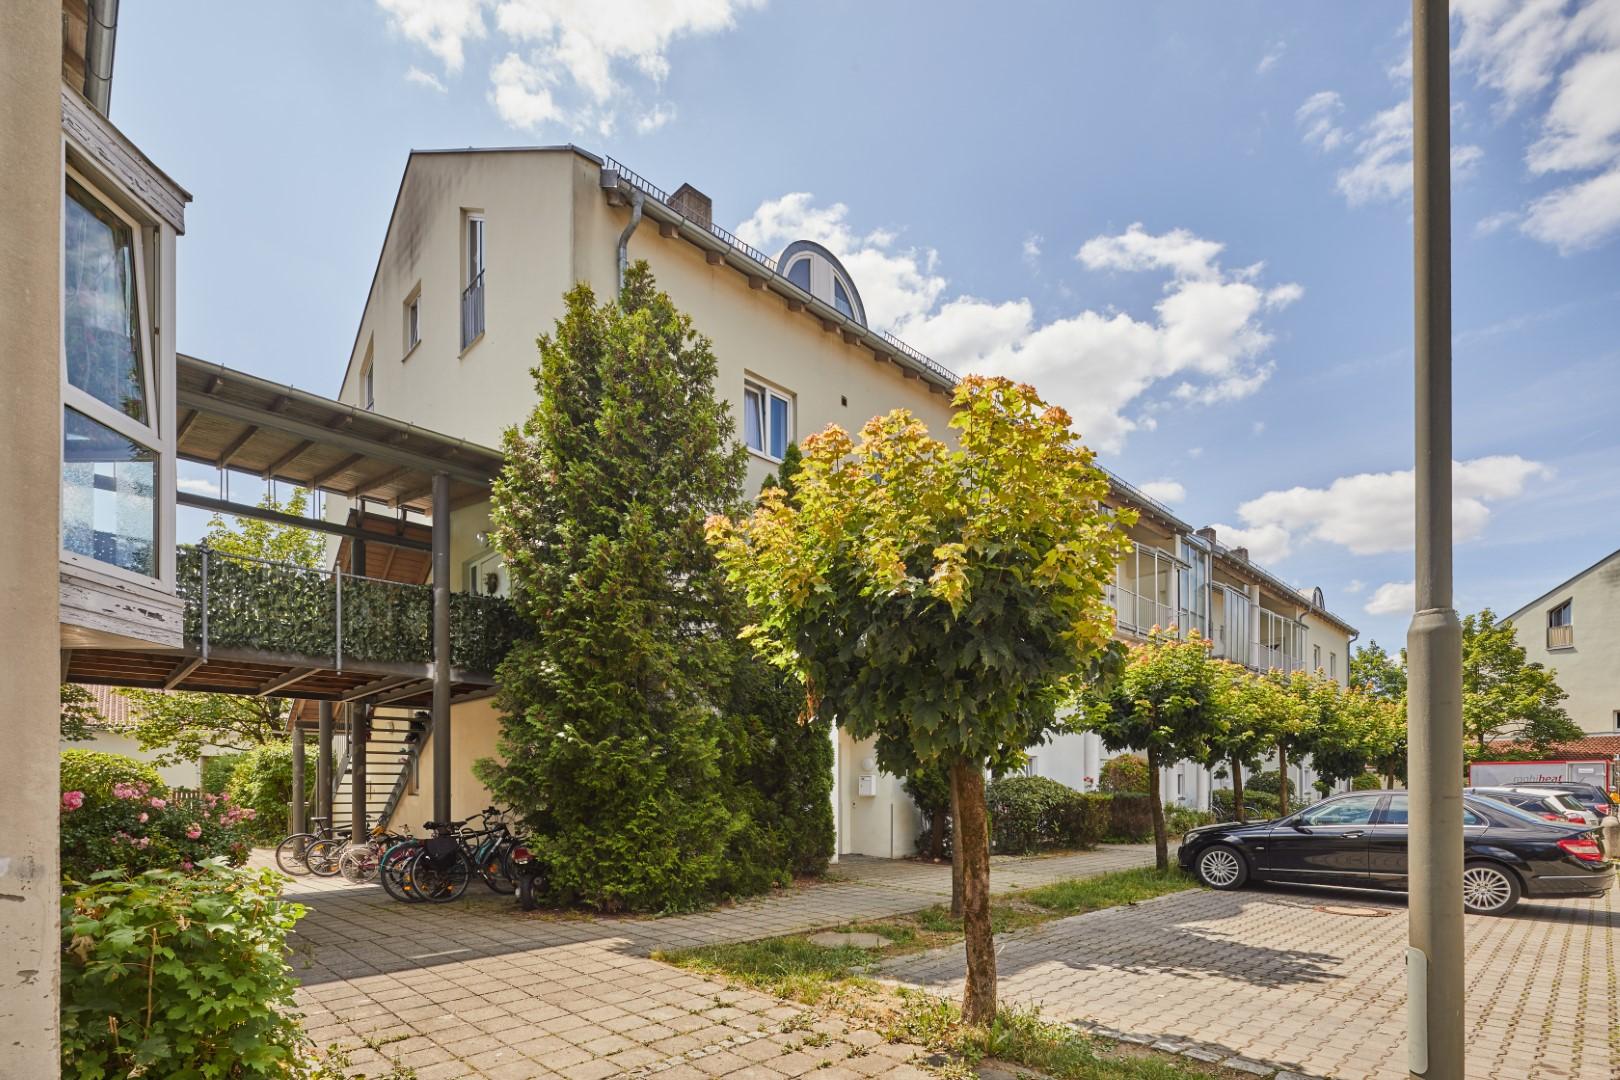 Brüxer Straße 3 - 5